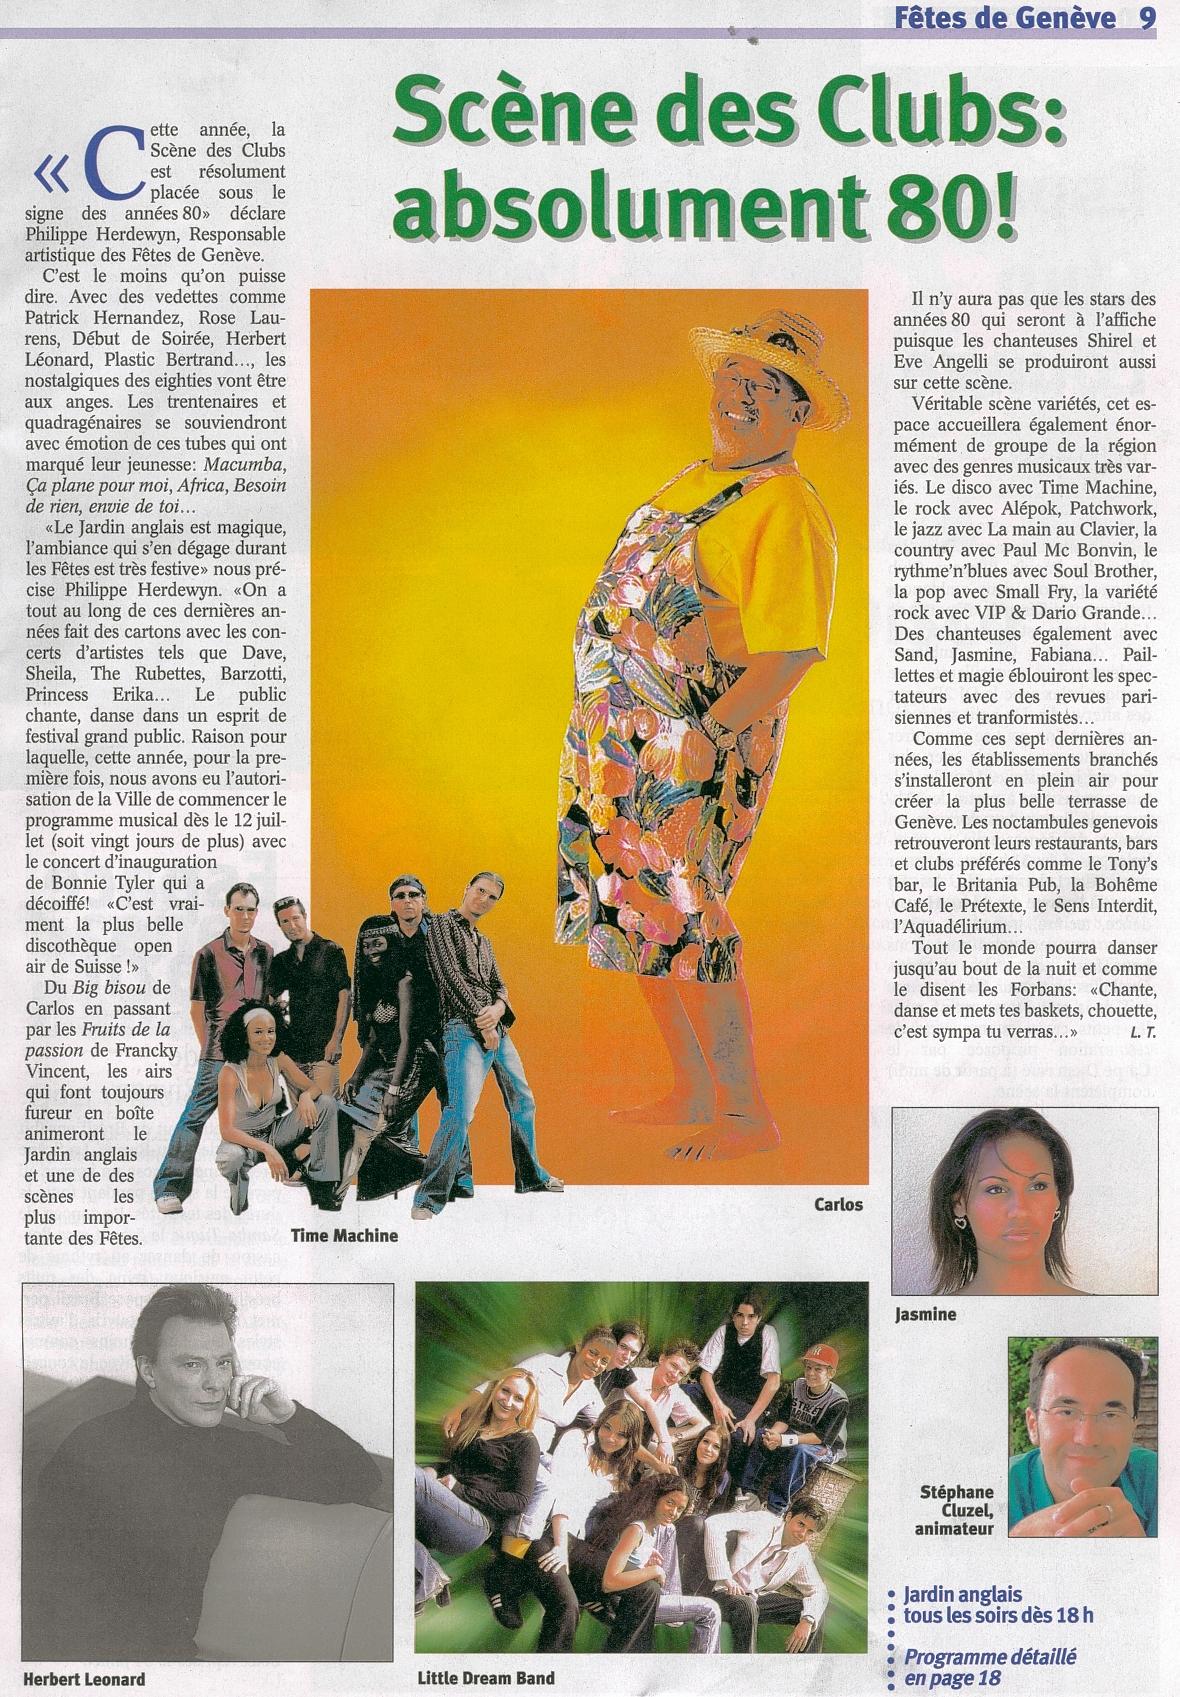 Programme_Fêtes_de_Genève_2004.jpg